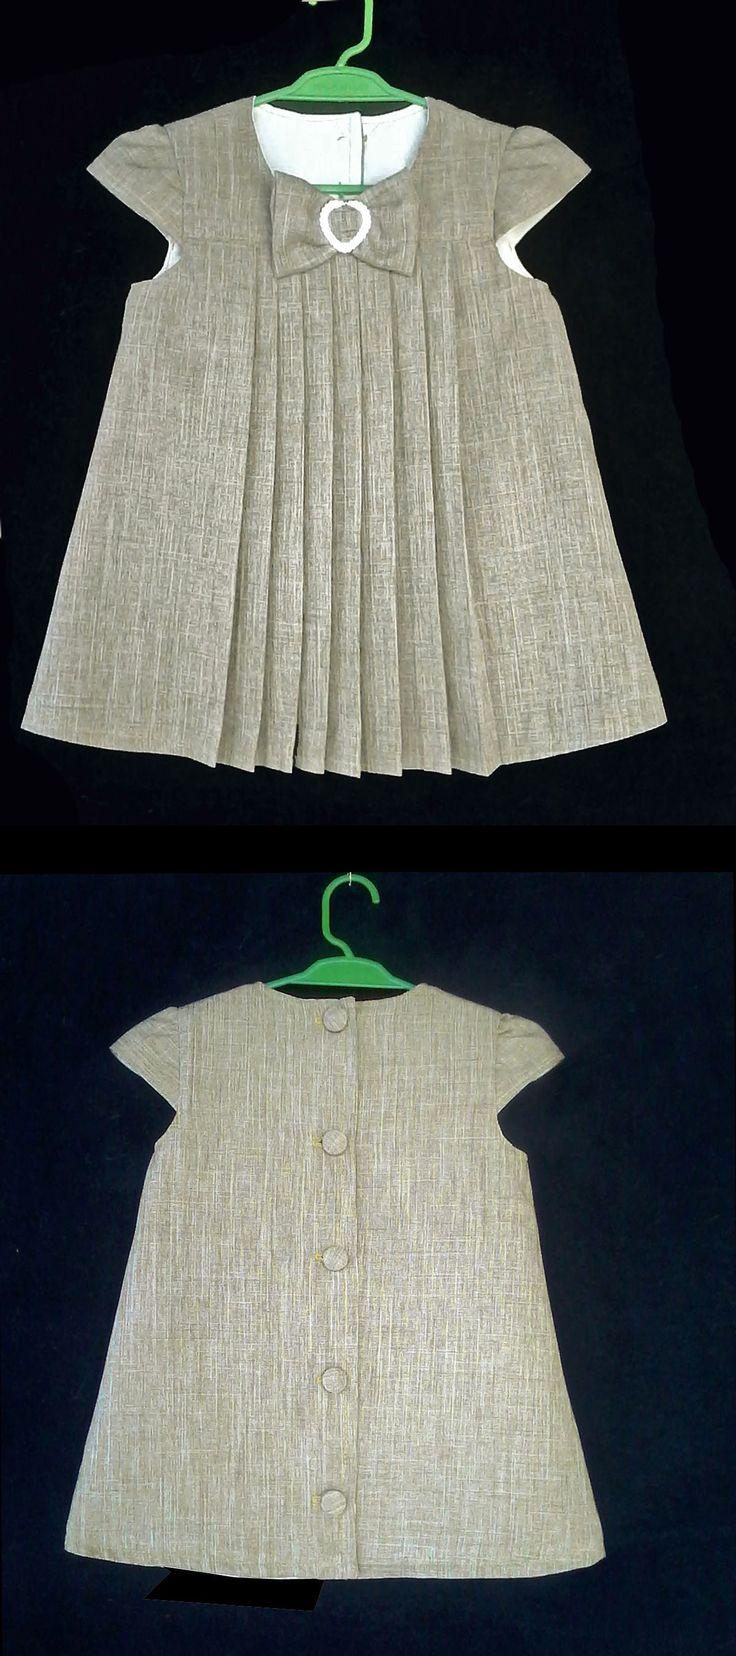 Vestido de Pregas 18meses-Pleats Dress 18 months................ Molde grátis - Free Pattern ------------ https://www.facebook.com/groups/1594730384185604/    ------------   RLevyFile-VestidoDePregas18m-PleatsDress18mo